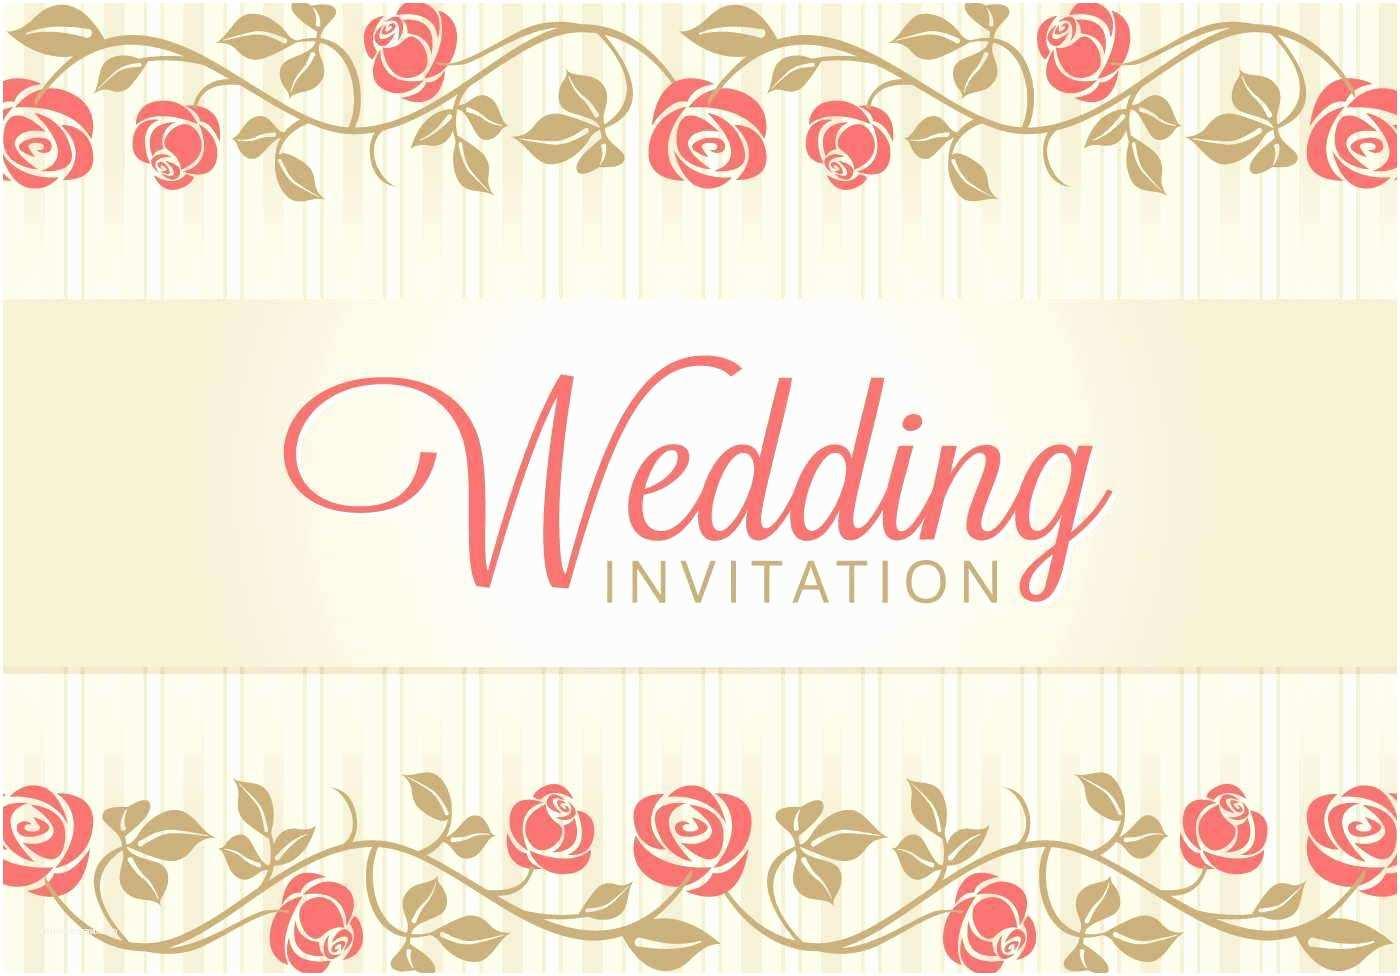 Wedding Invitation Designs Free Download Fresh Wedding Invitation Background Designs Free Download